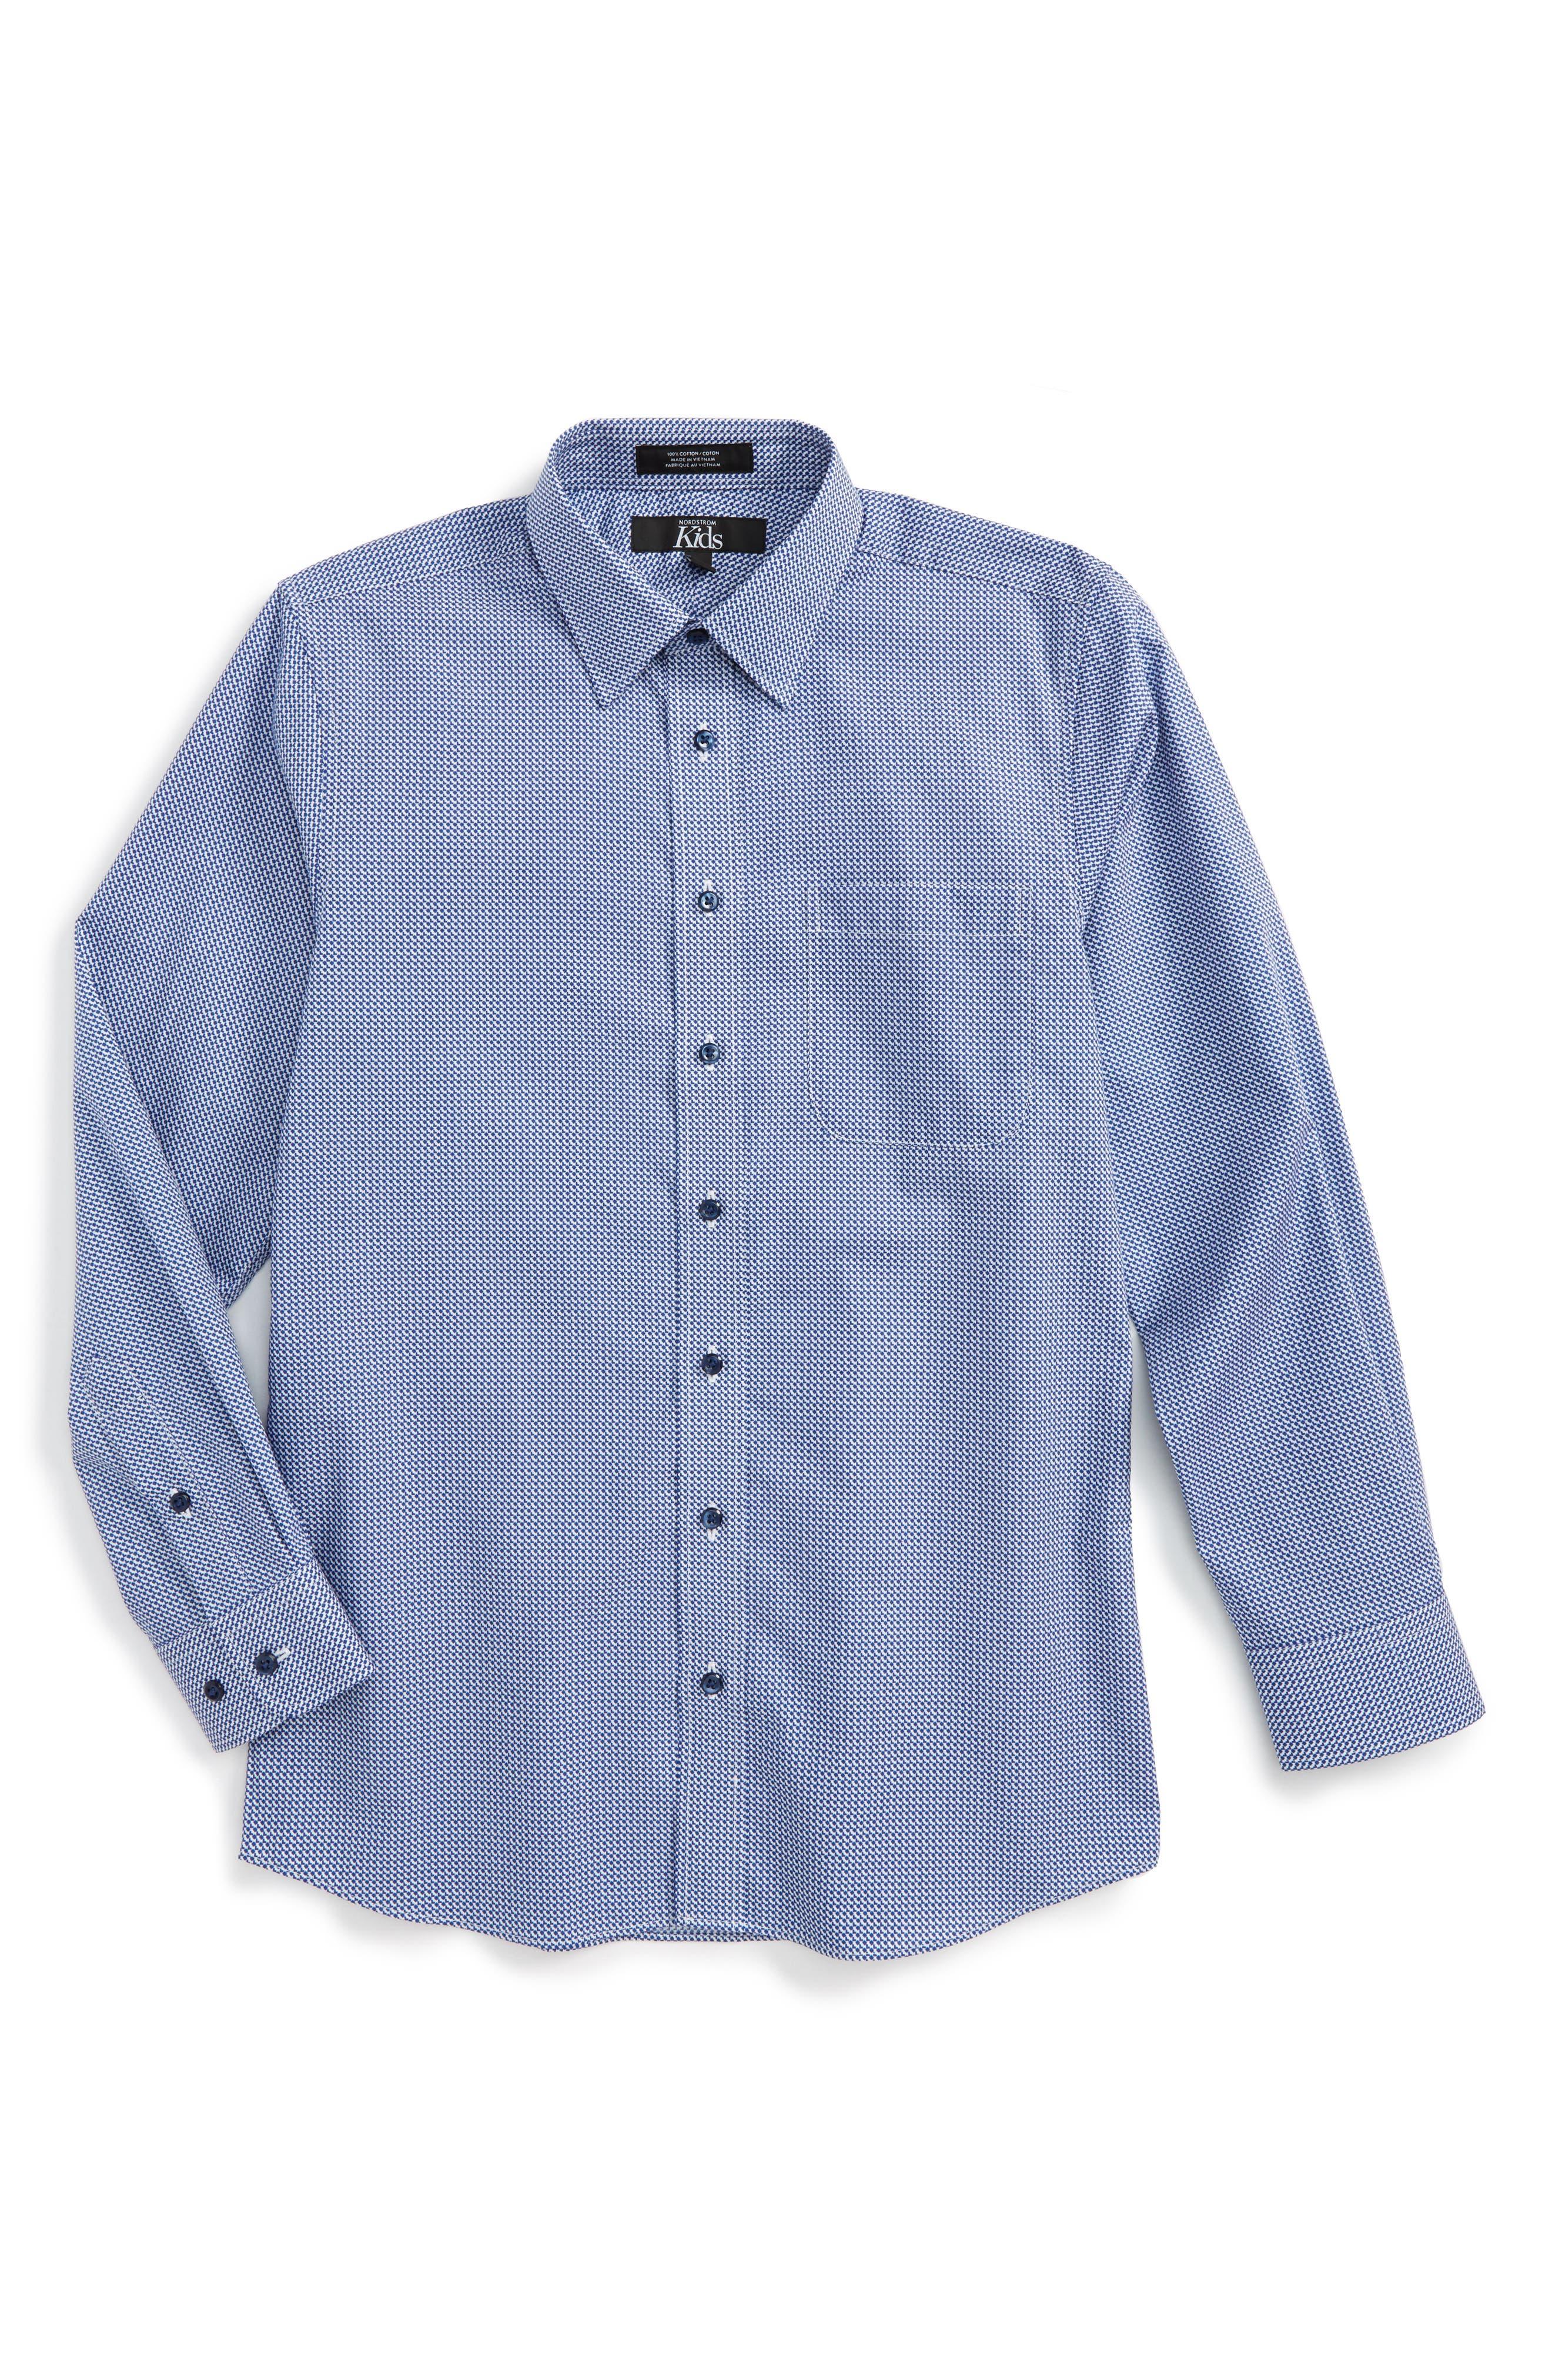 Nordstrom Neat Dress Shirt (Big Boys)